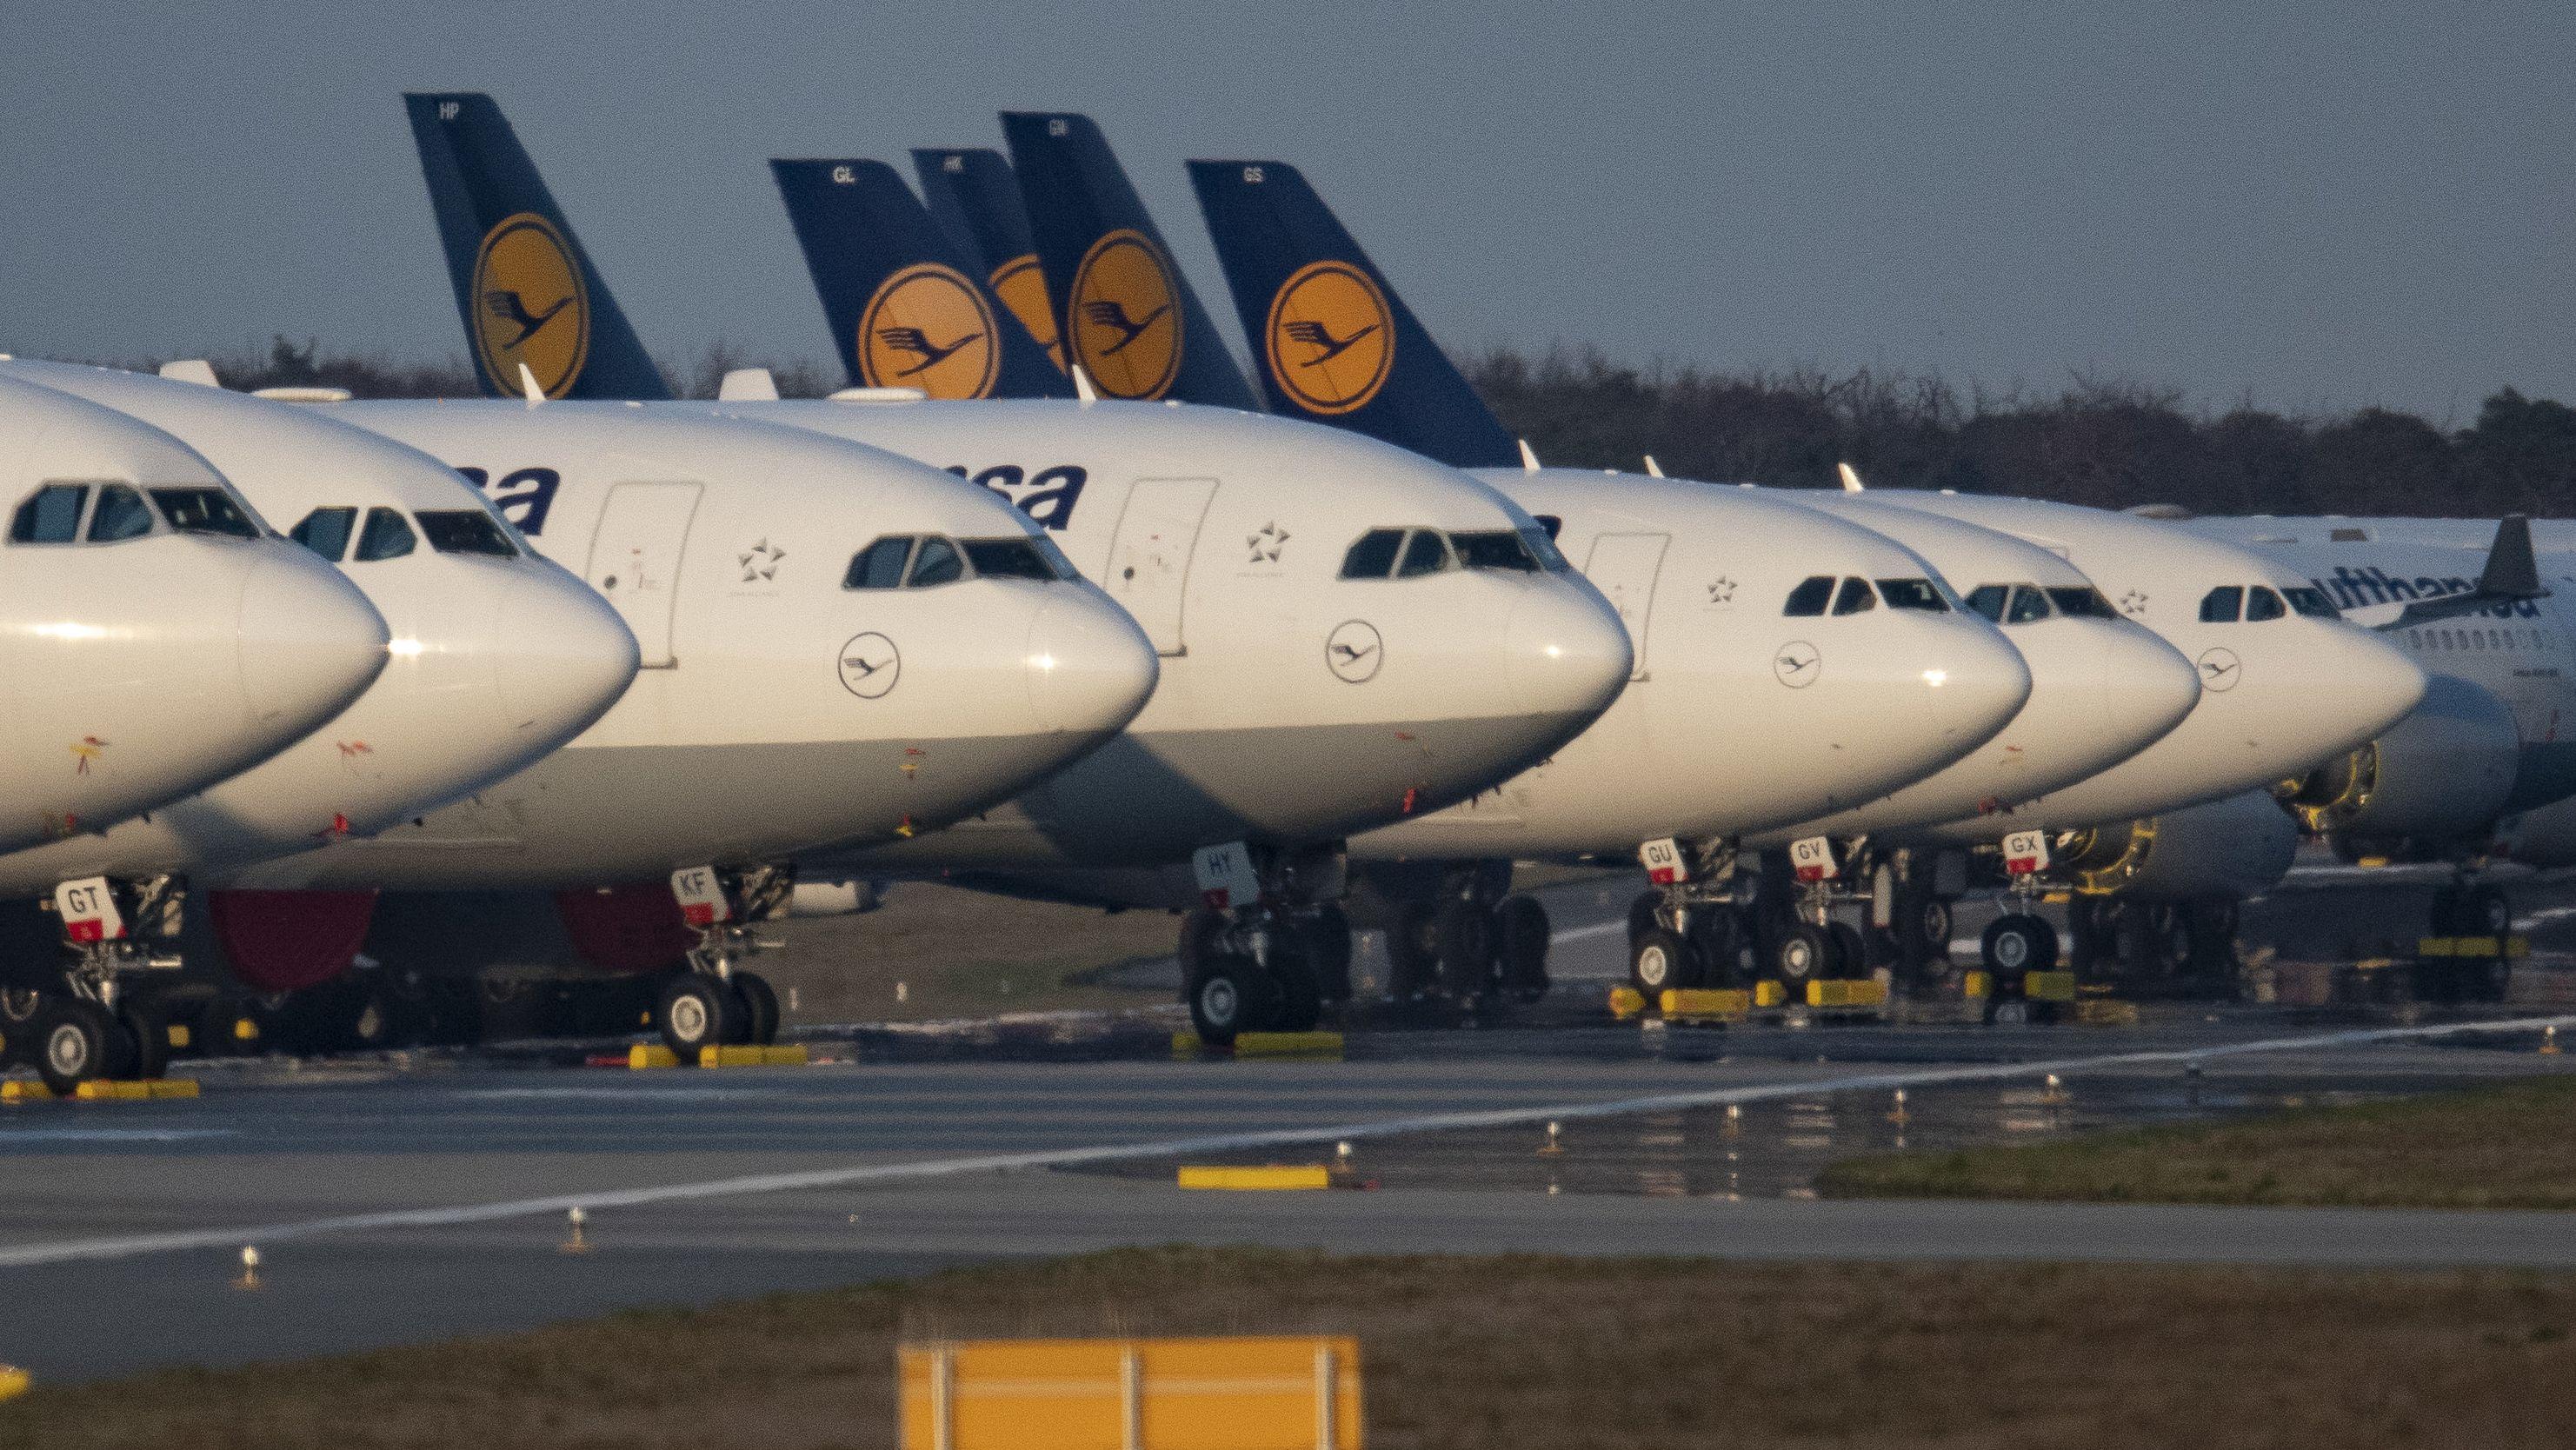 Flugzeuge in Reihe geparkt